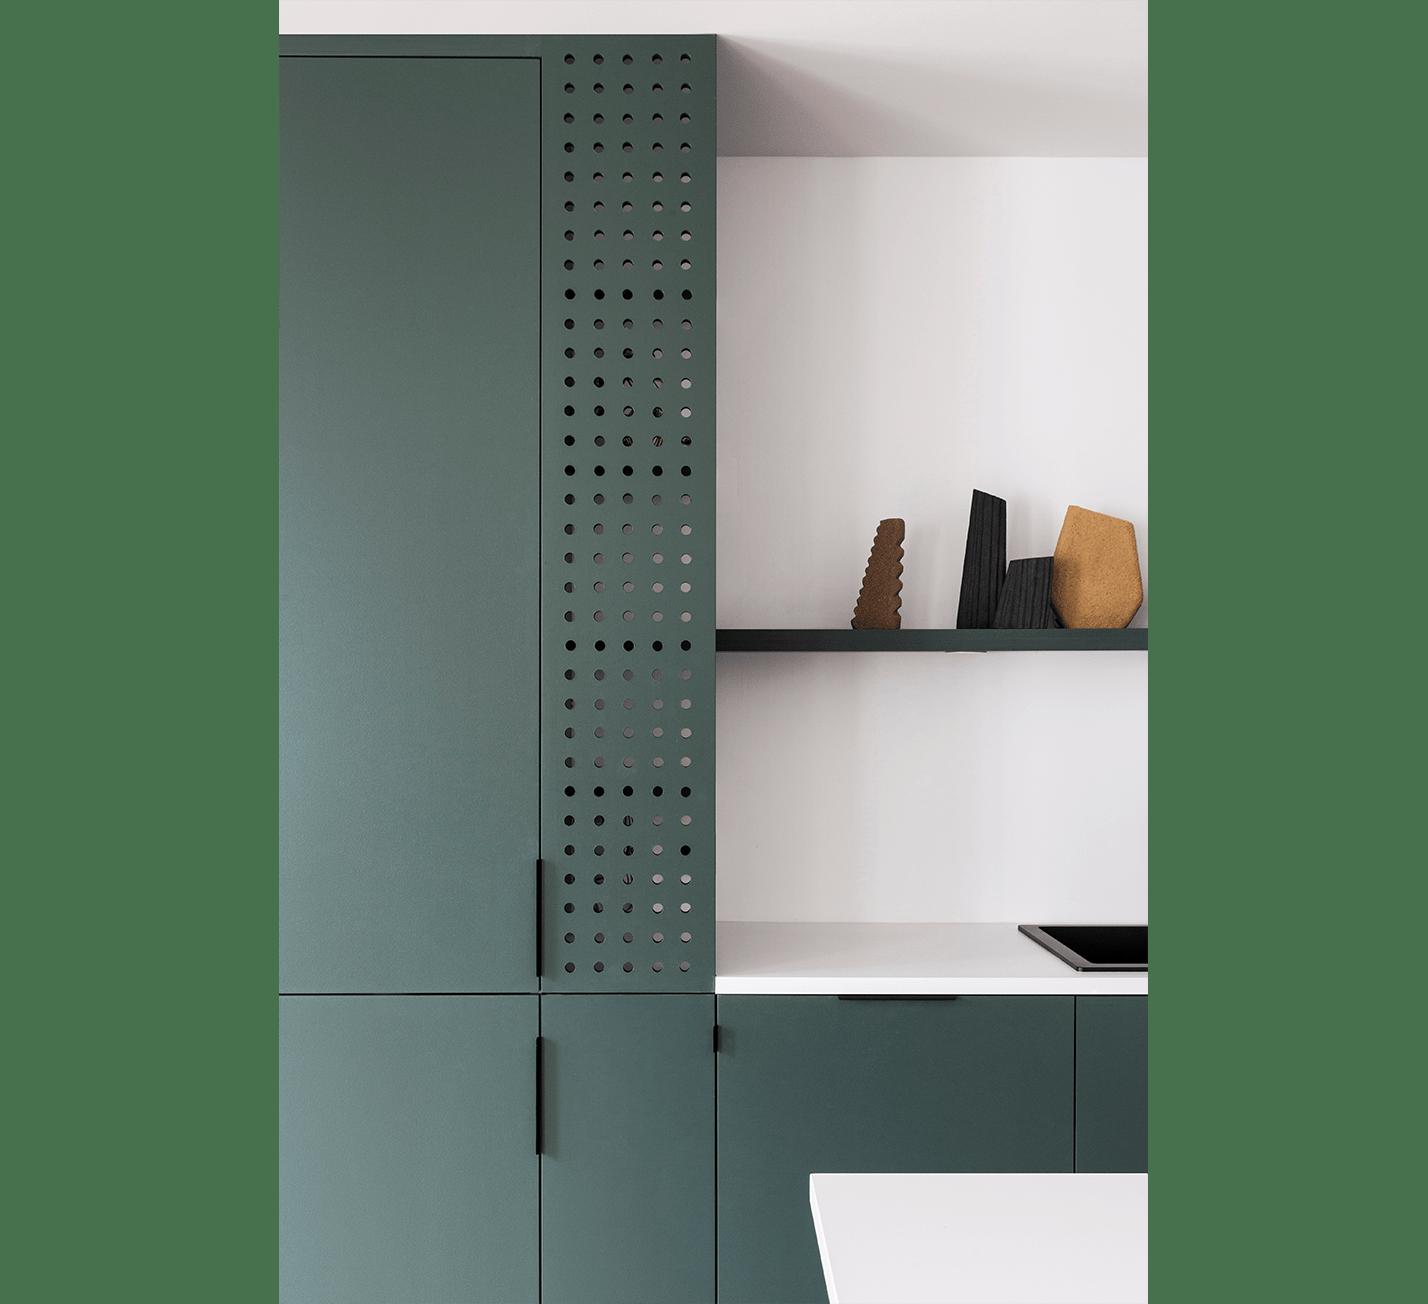 Projet-Jules-Cesar-Atelier-Steve-Pauline-Borgia-Architecte-interieur-02-min